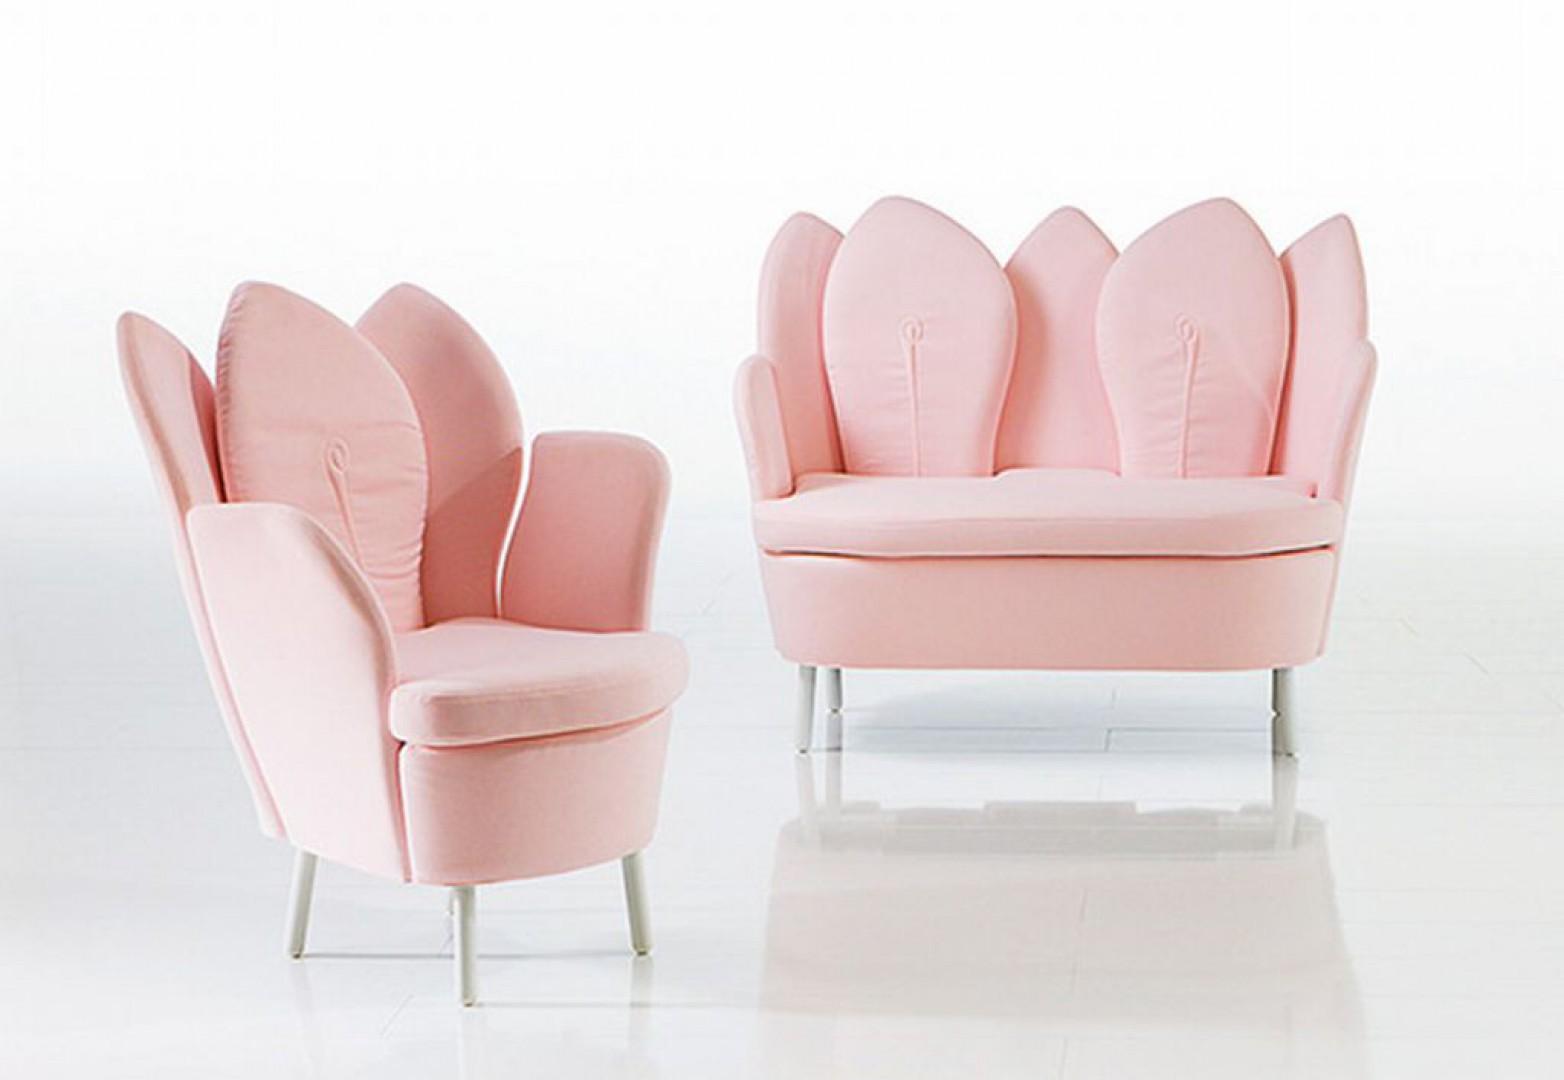 rynek mebli firma br hl zorganizowa a targi wewn trzne. Black Bedroom Furniture Sets. Home Design Ideas